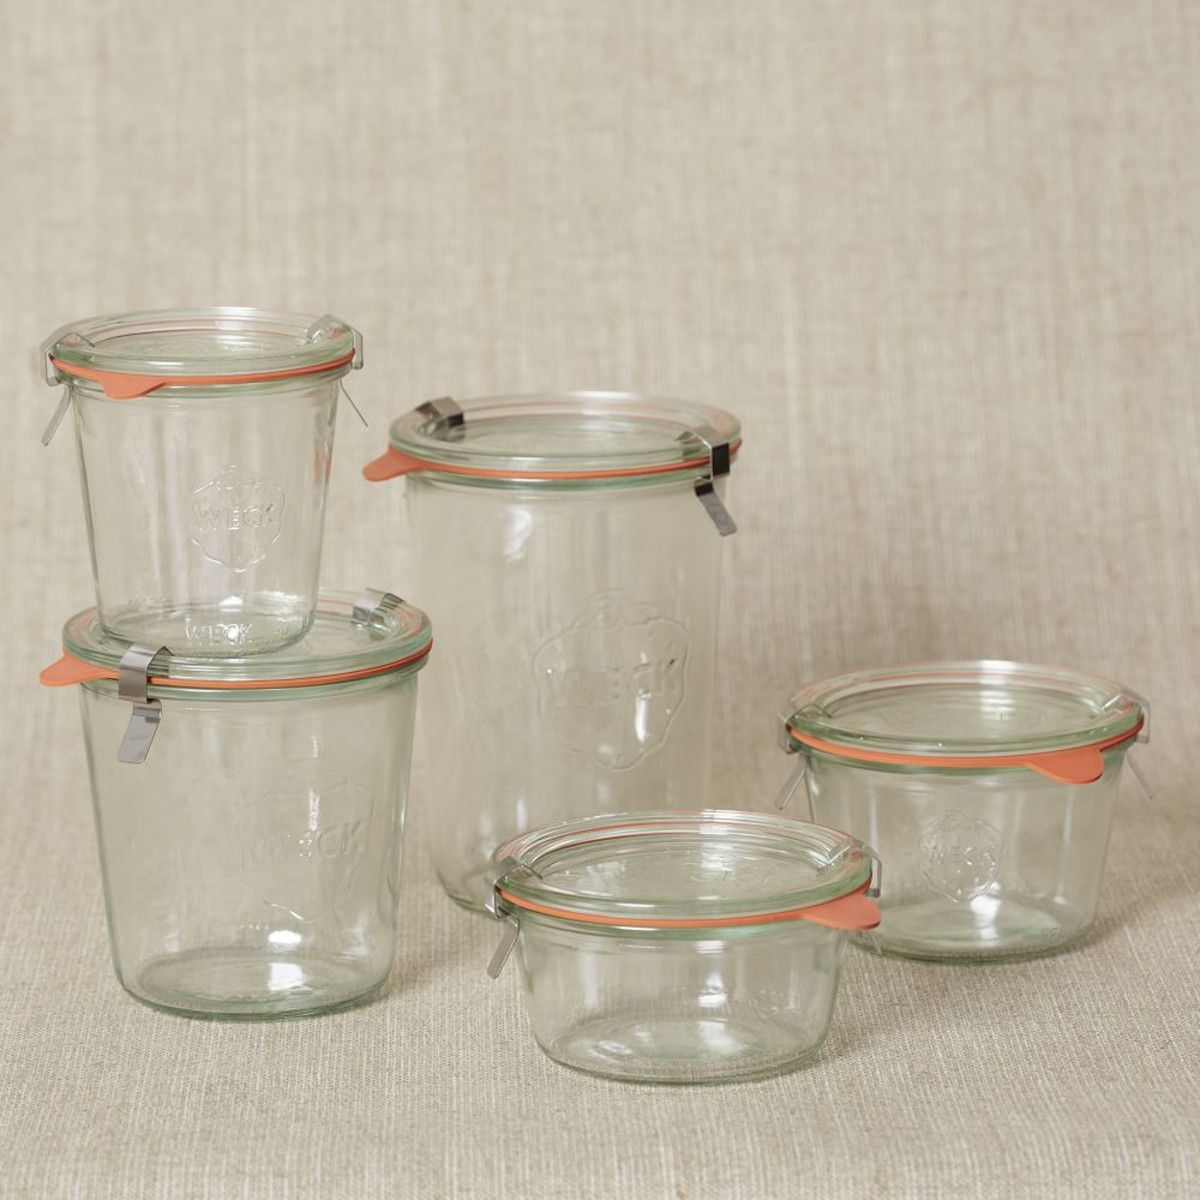 Weck Glass Jars - add a LEON engraving. | Cookshop | Pinterest ...